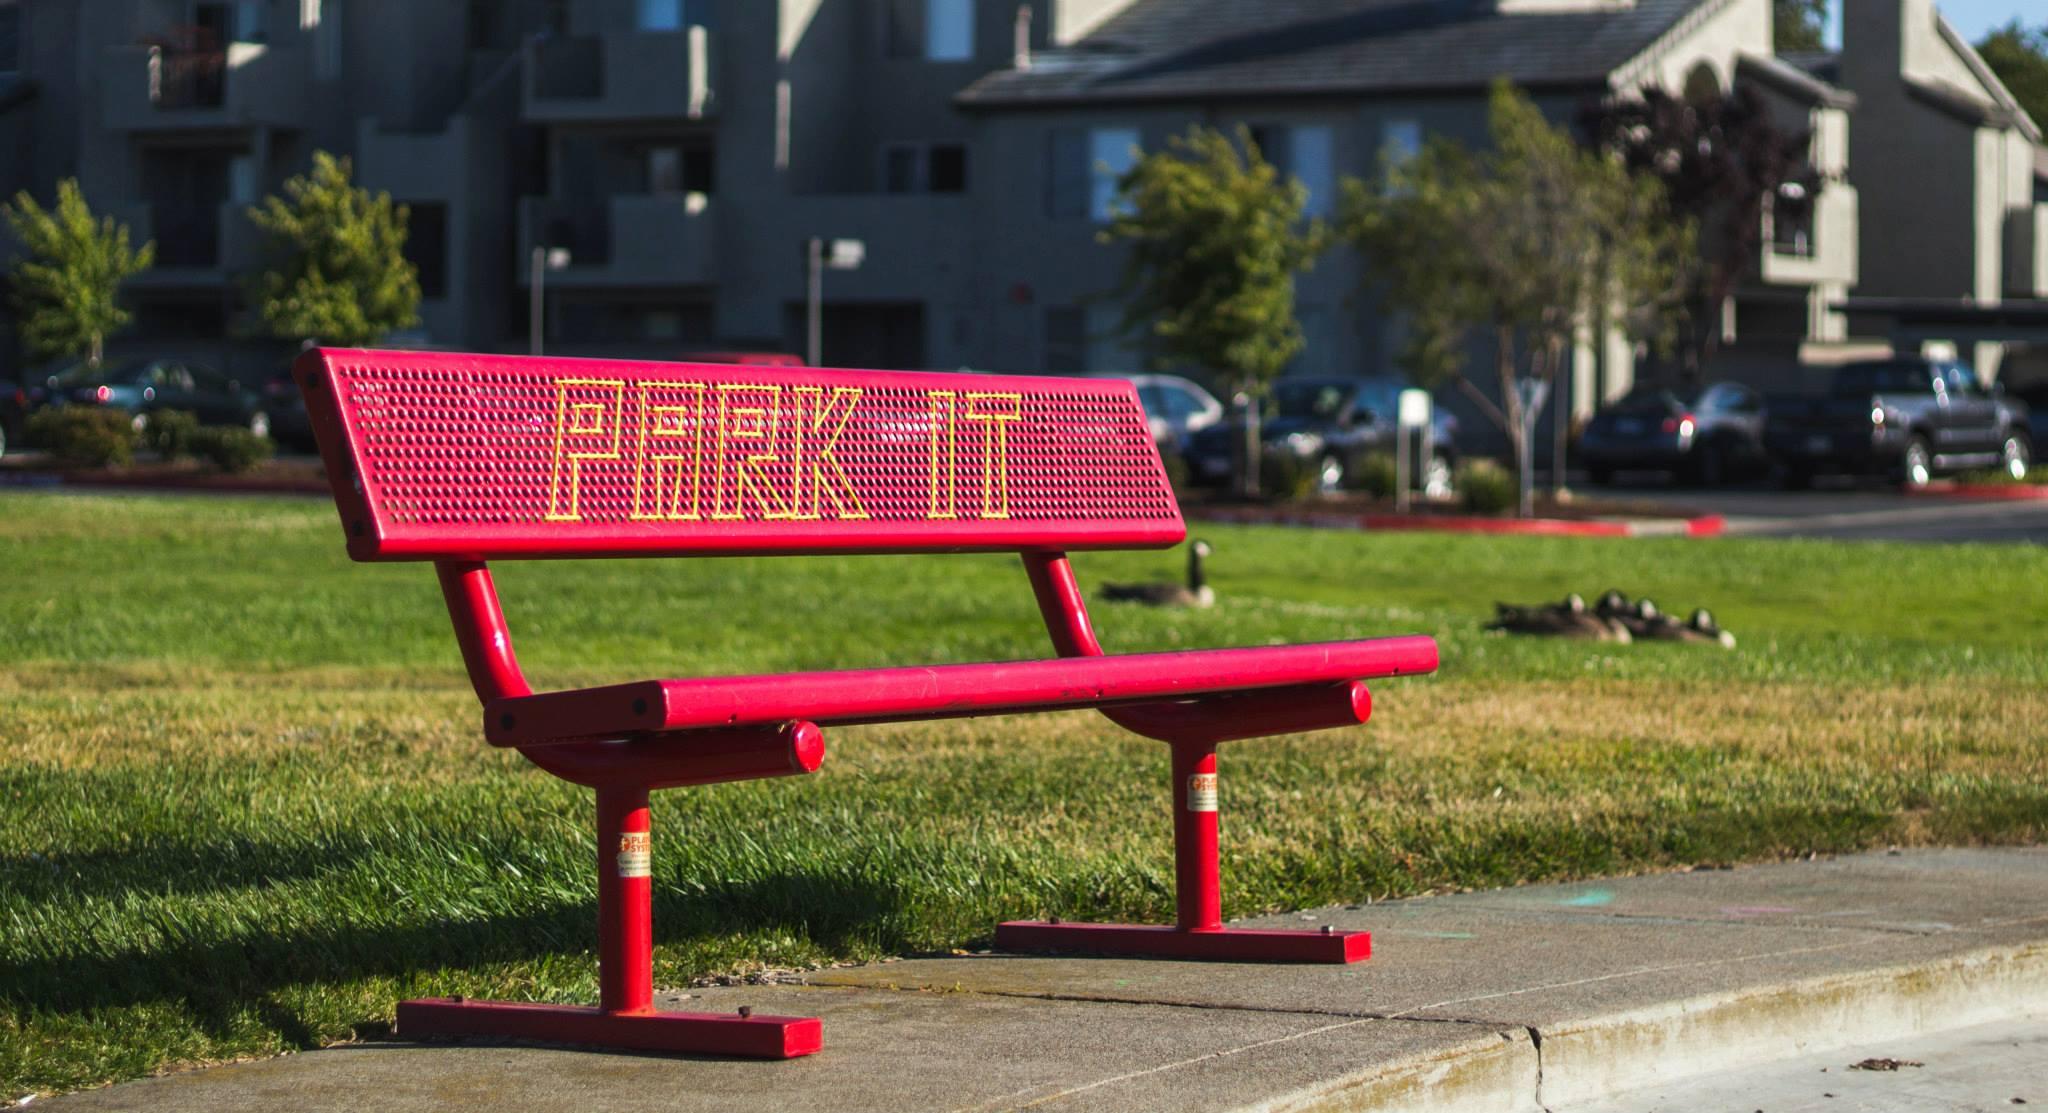 yarn bombing bench - photo #22